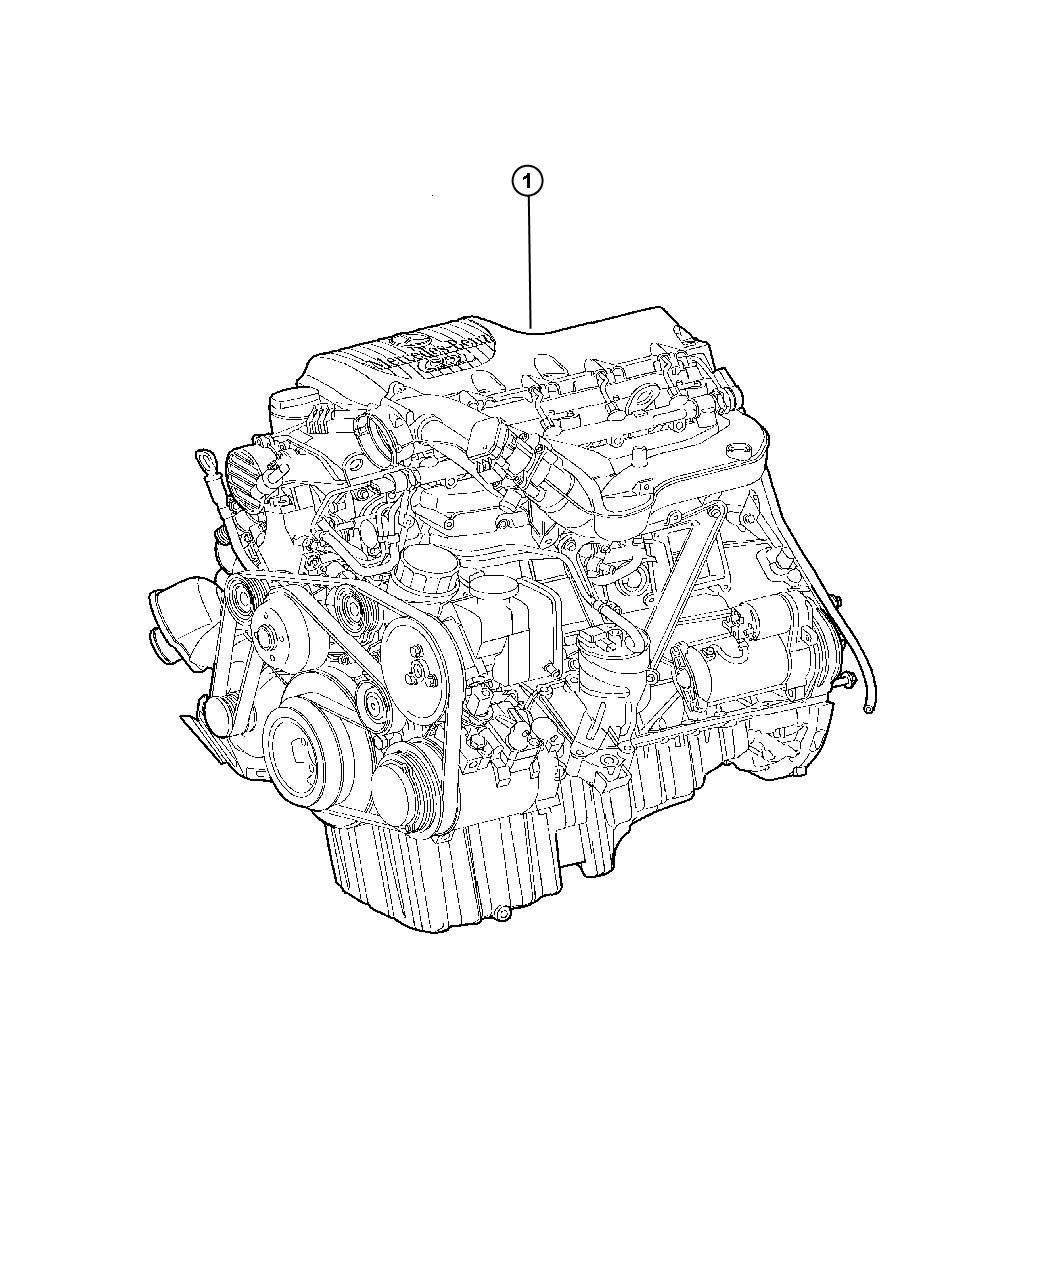 Dodge Sprinter Engine Completesel Turbo